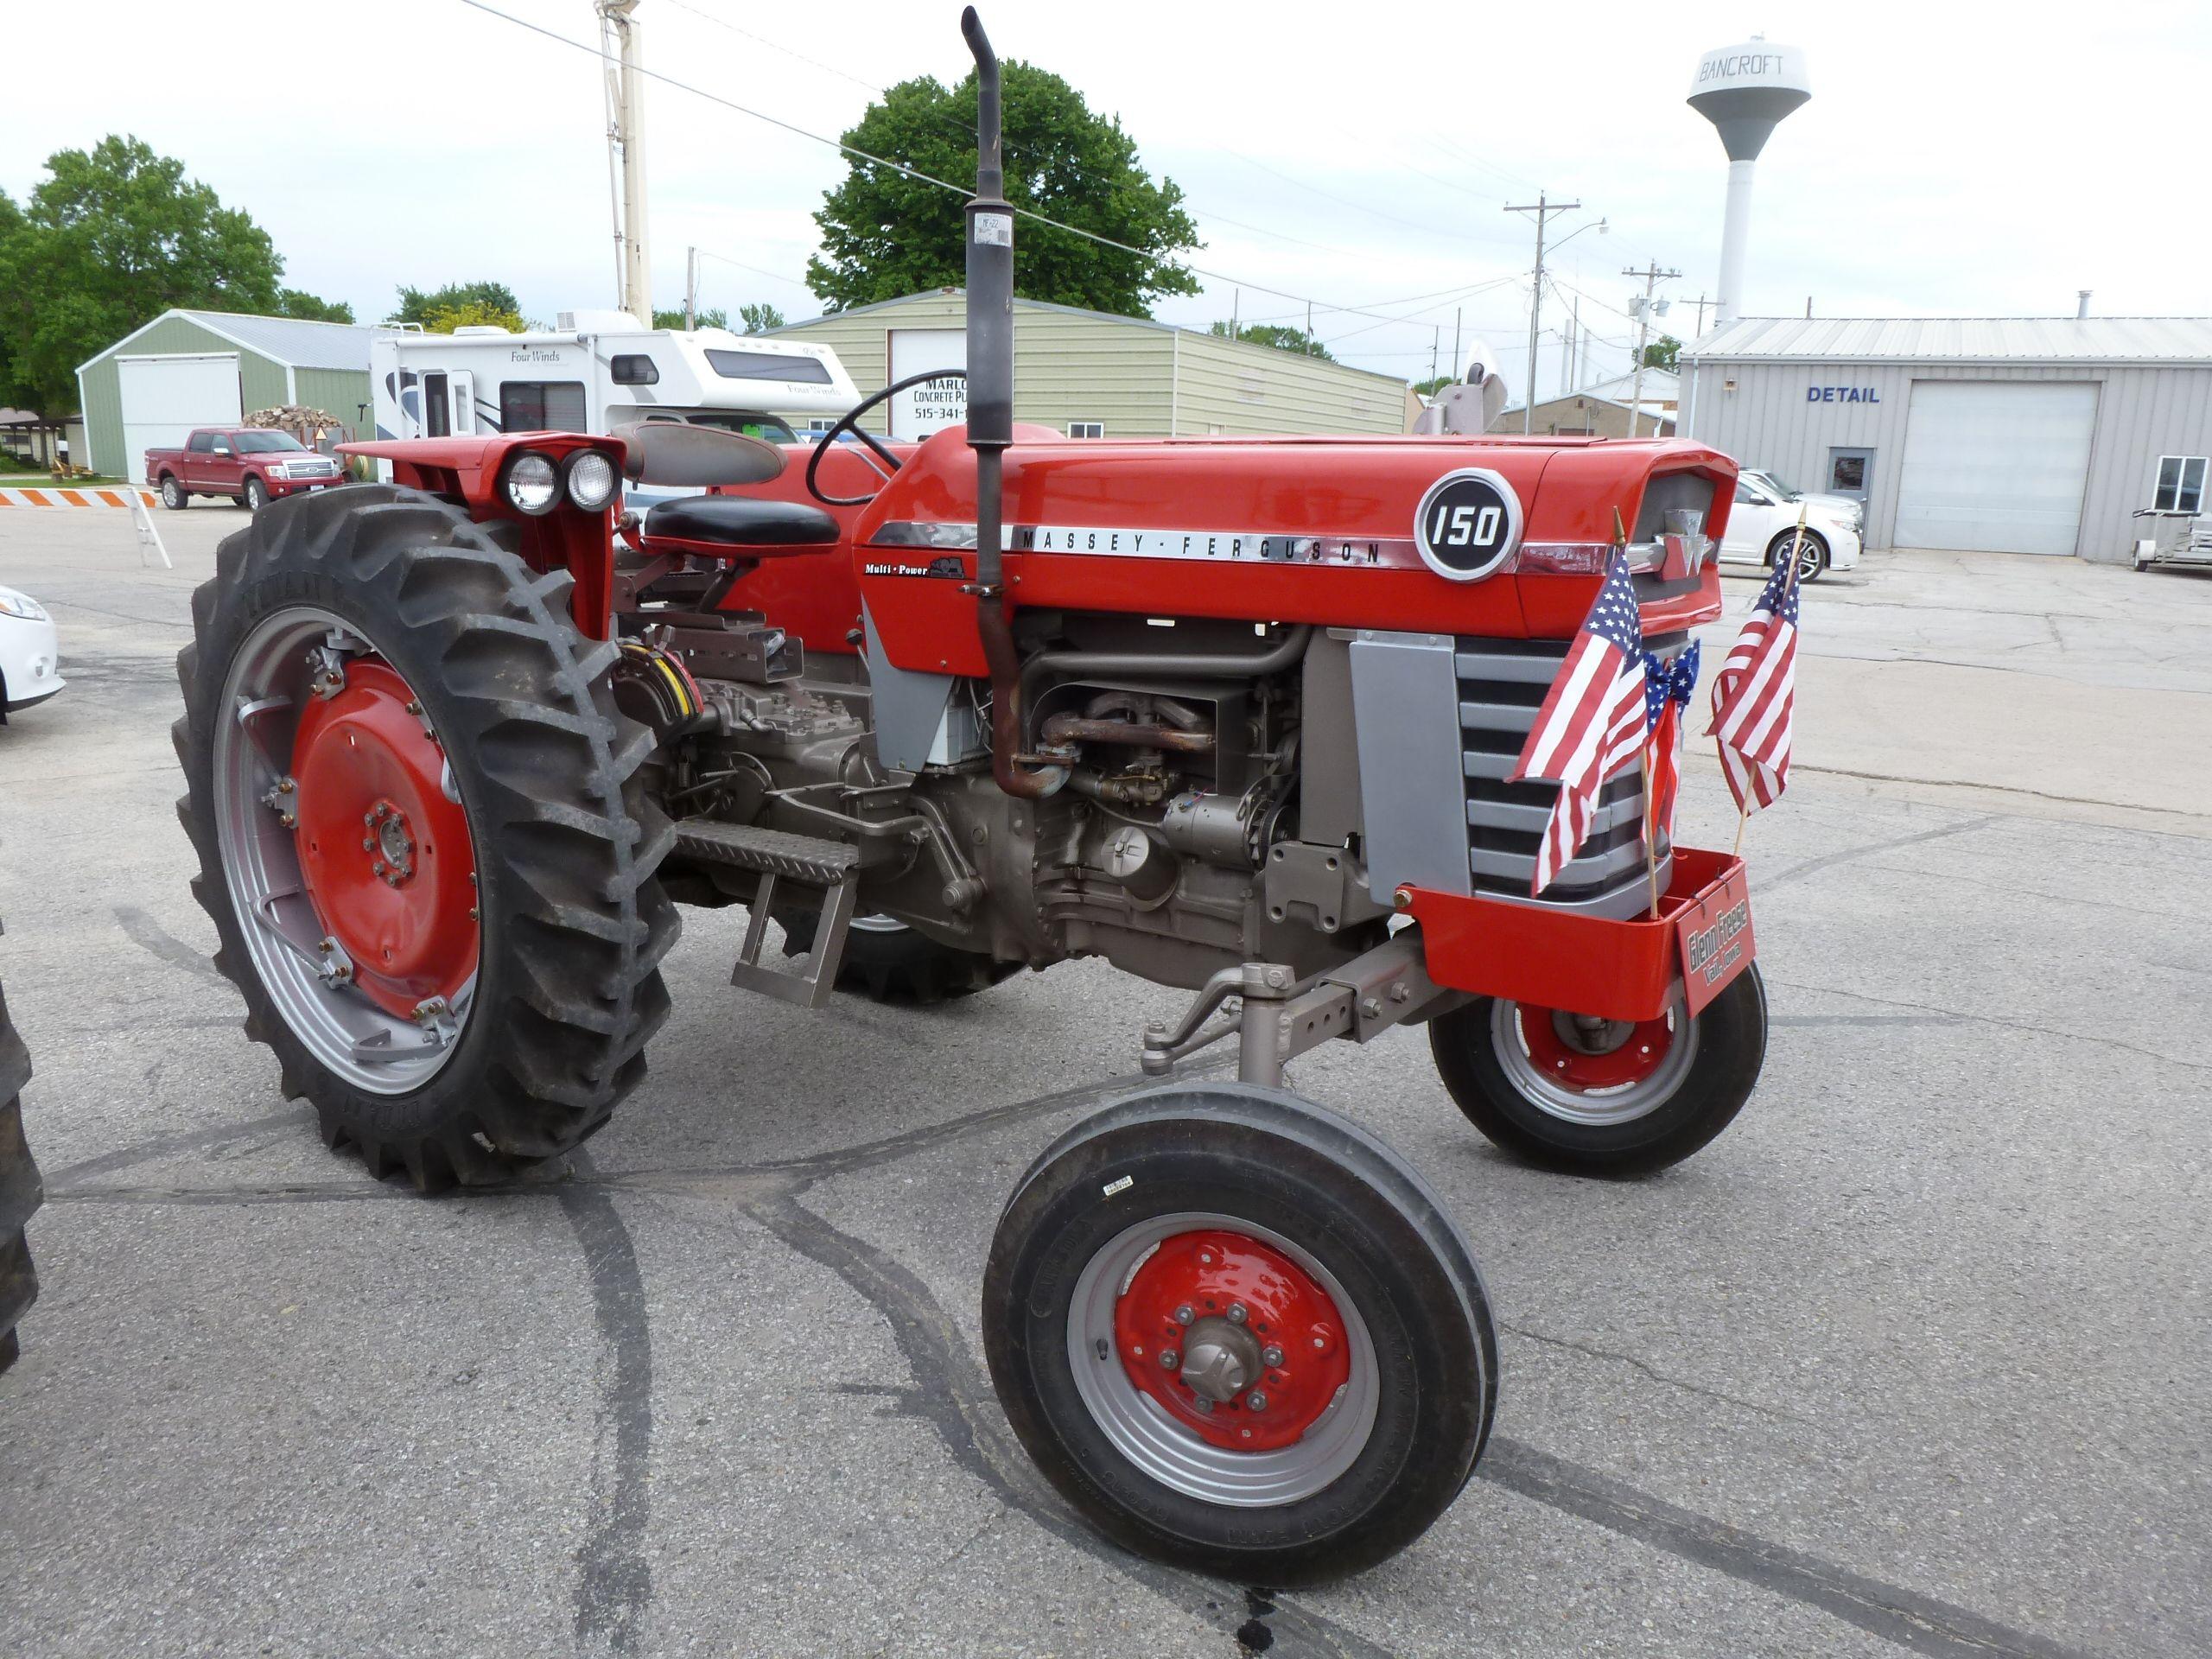 Massey Ferguson 150 : Massey ferguson kicd antique tractor ride